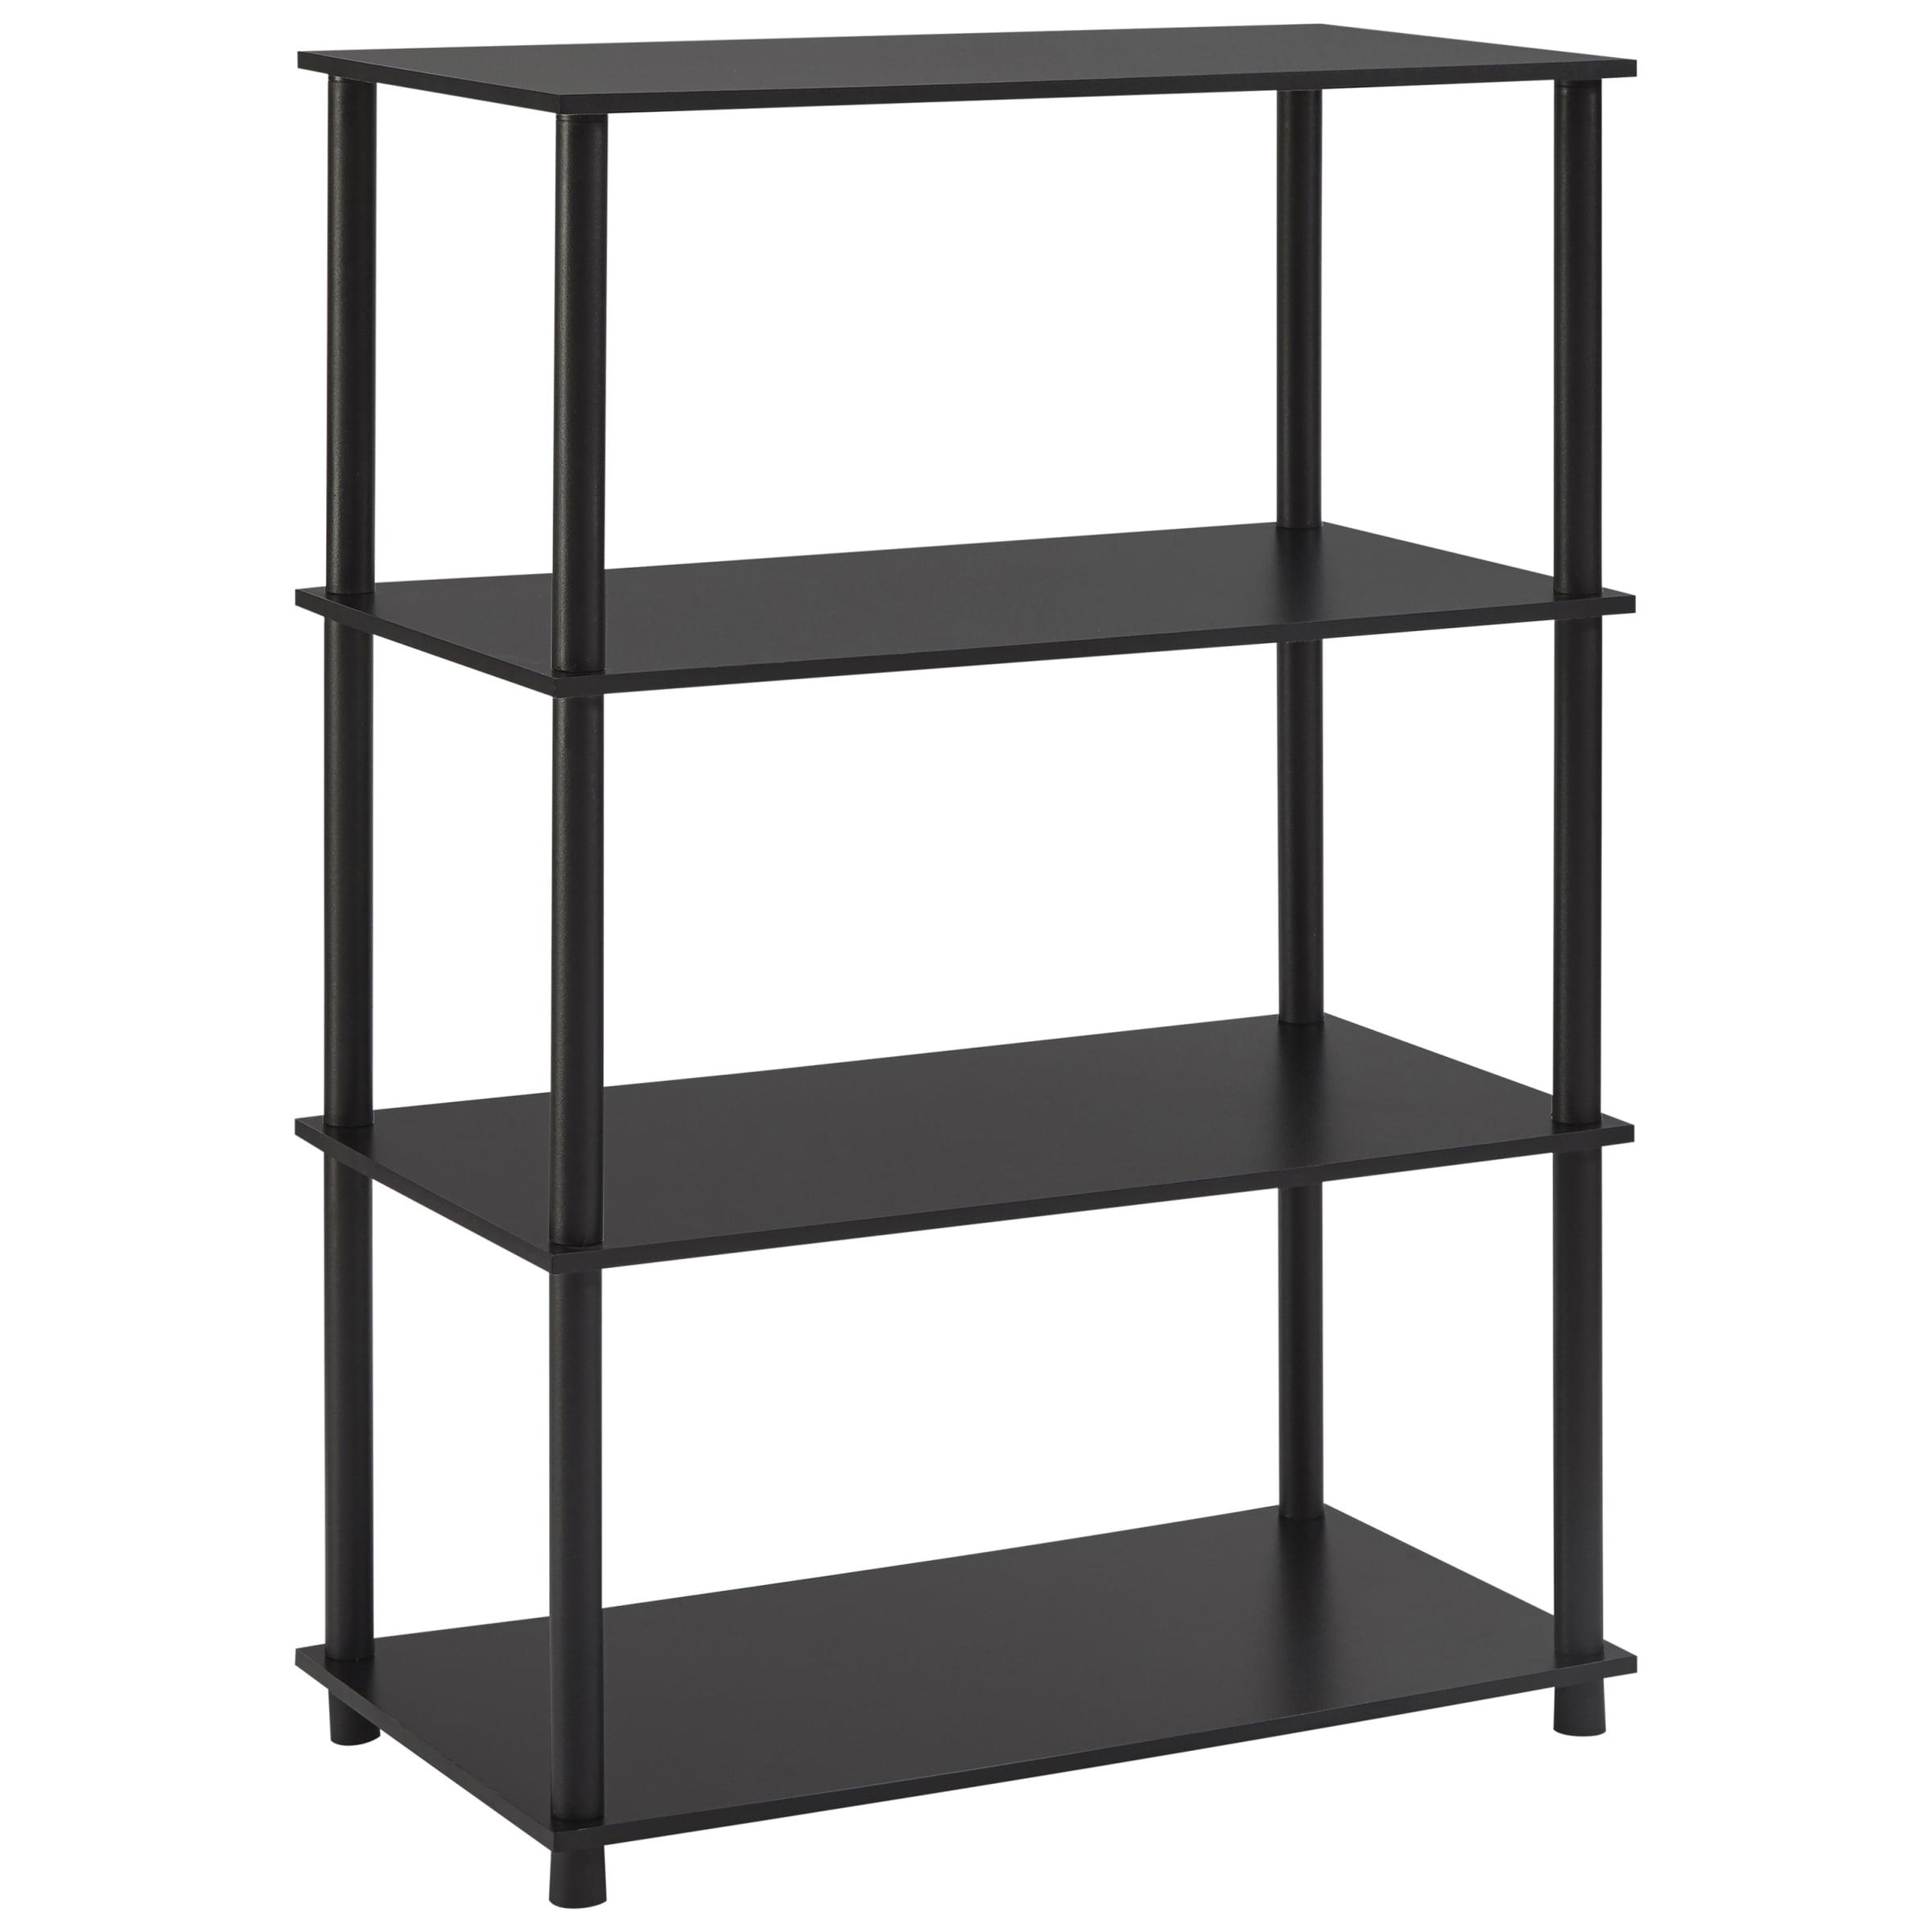 Mainstays 42 6 Quot 4 Shelf Bookcase Black Finish Walmart Com